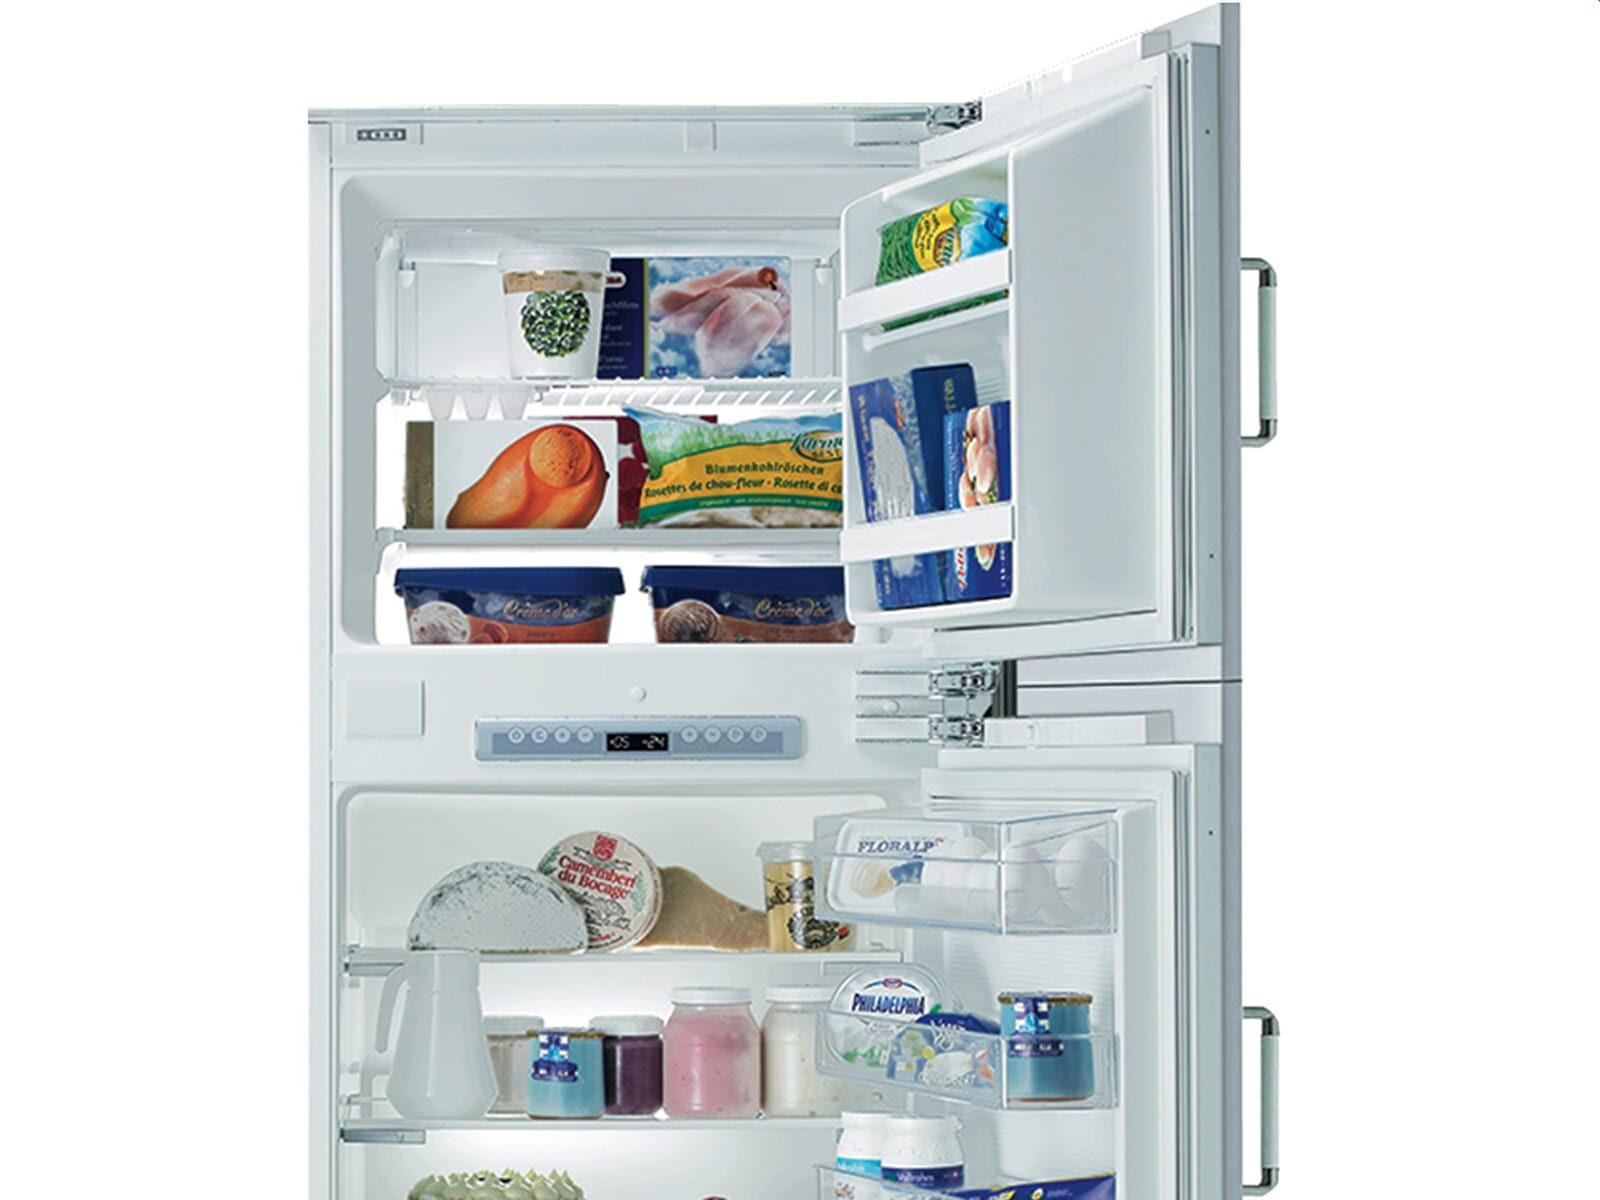 Amica Kühlschrank Stinkt : Kühlschrank noblesse v zug shafer lorrie